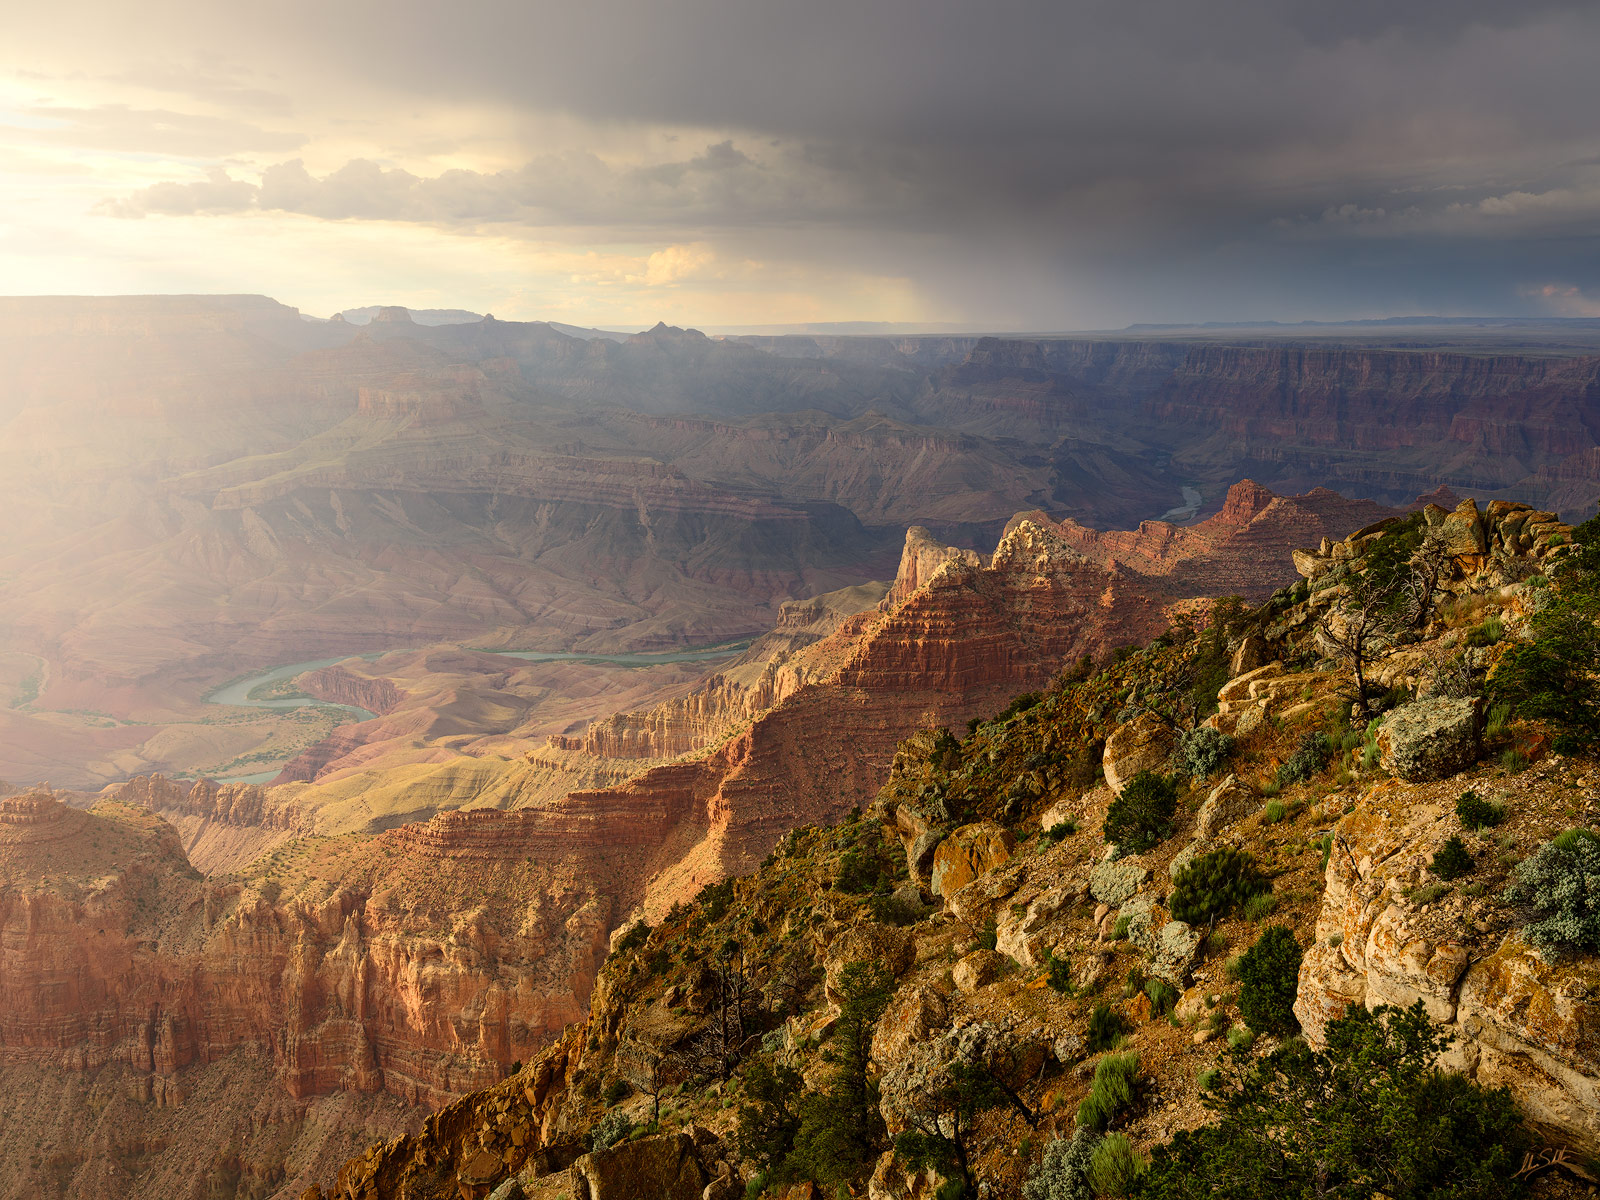 AZ, Arizona, Cardenas Butte, Colorado River, Escalante Butte, Fuji, Fujifilm, GFX 50R, Grand Canyon, Lipan Point, Monsoon, Monsoon Season, National Park, South Rim, Unkar Delta, photo